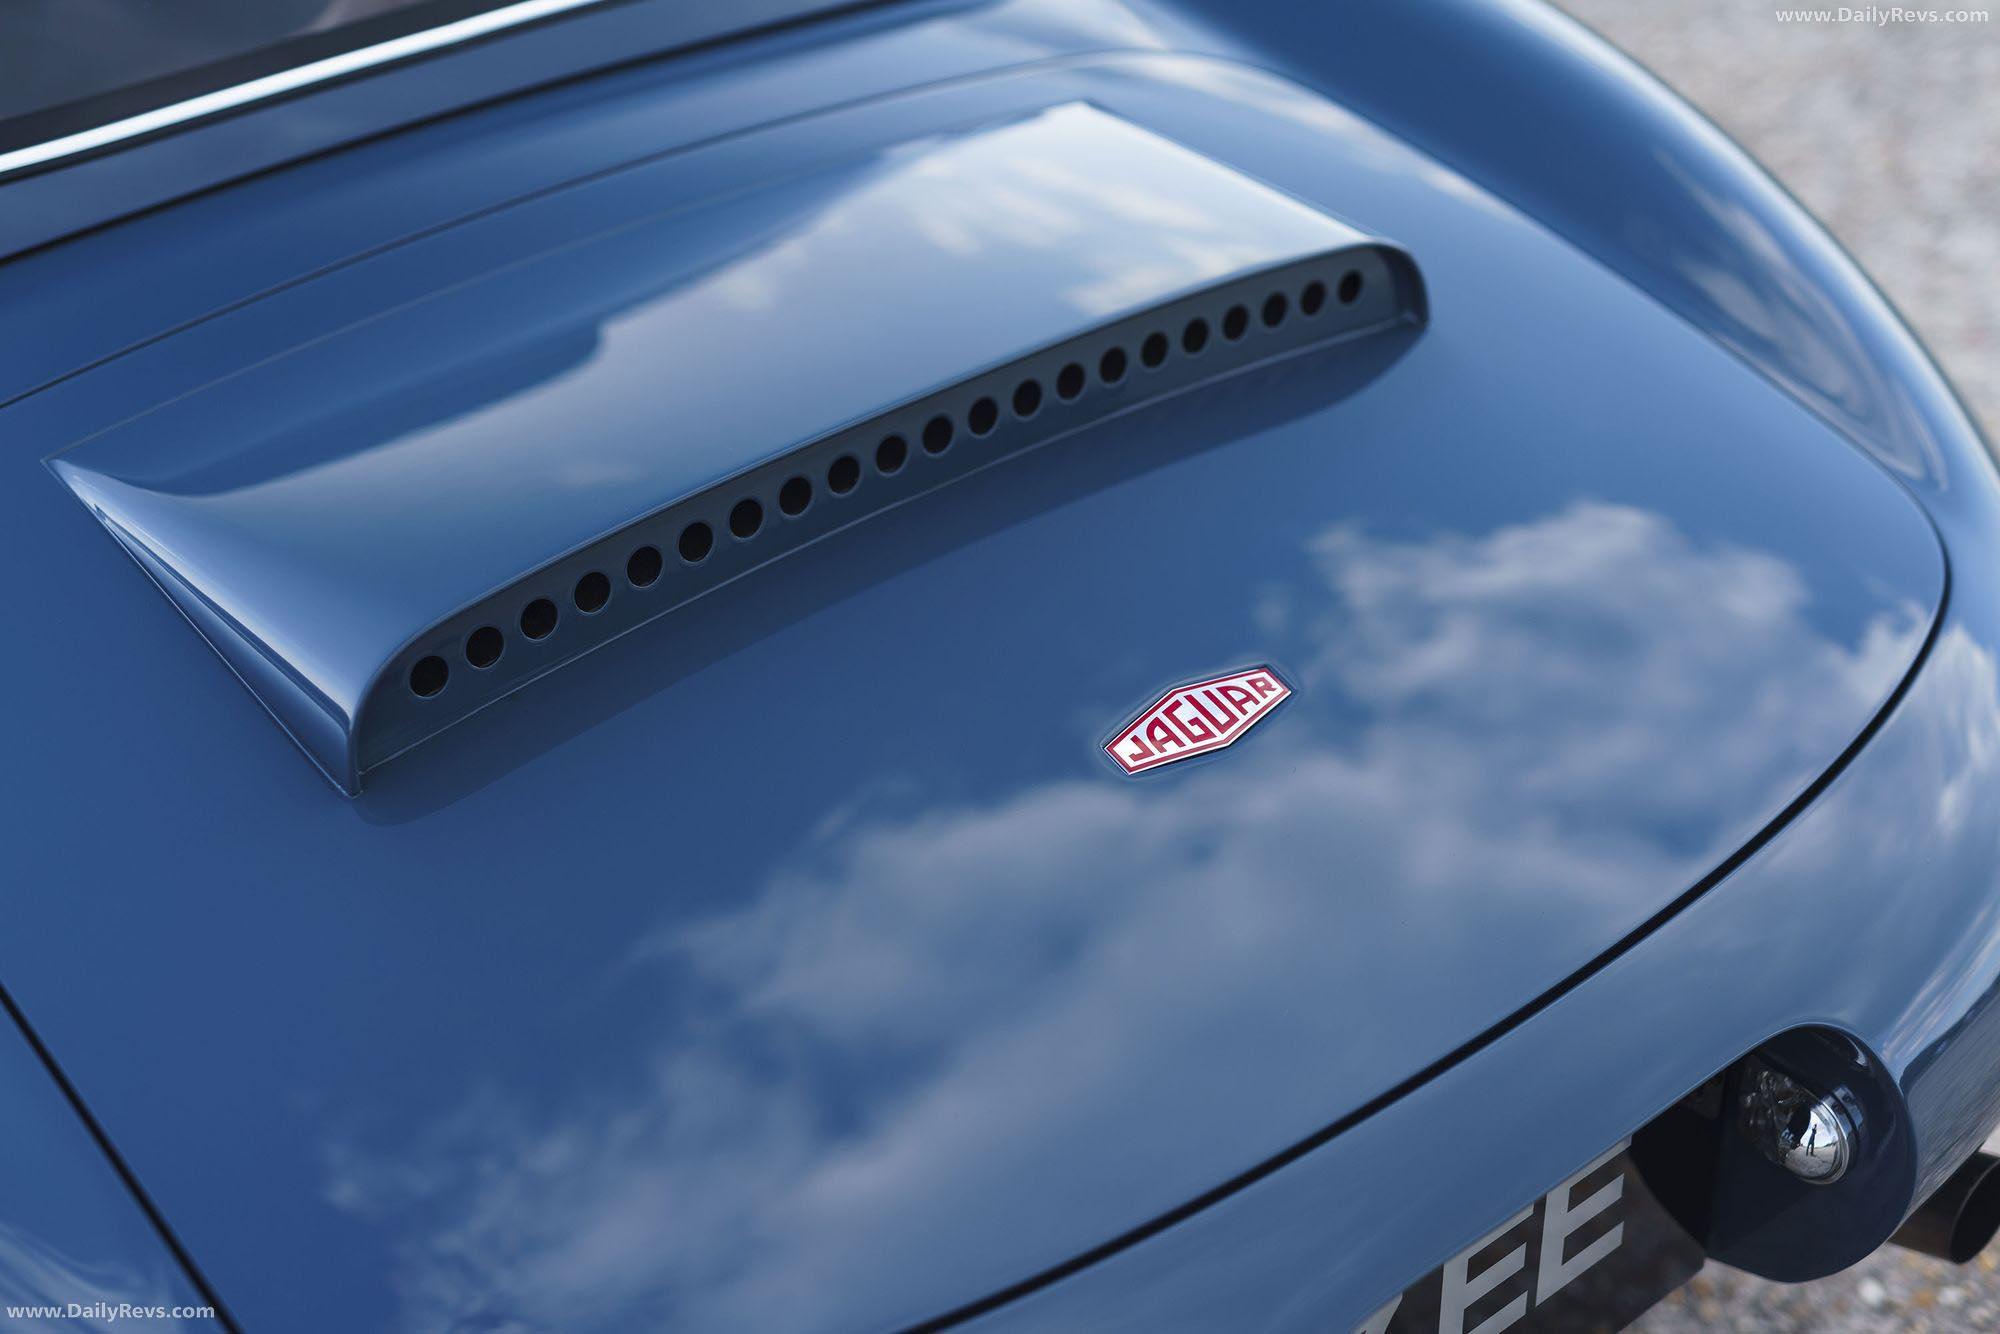 2020 Eagle Lightweight GT full